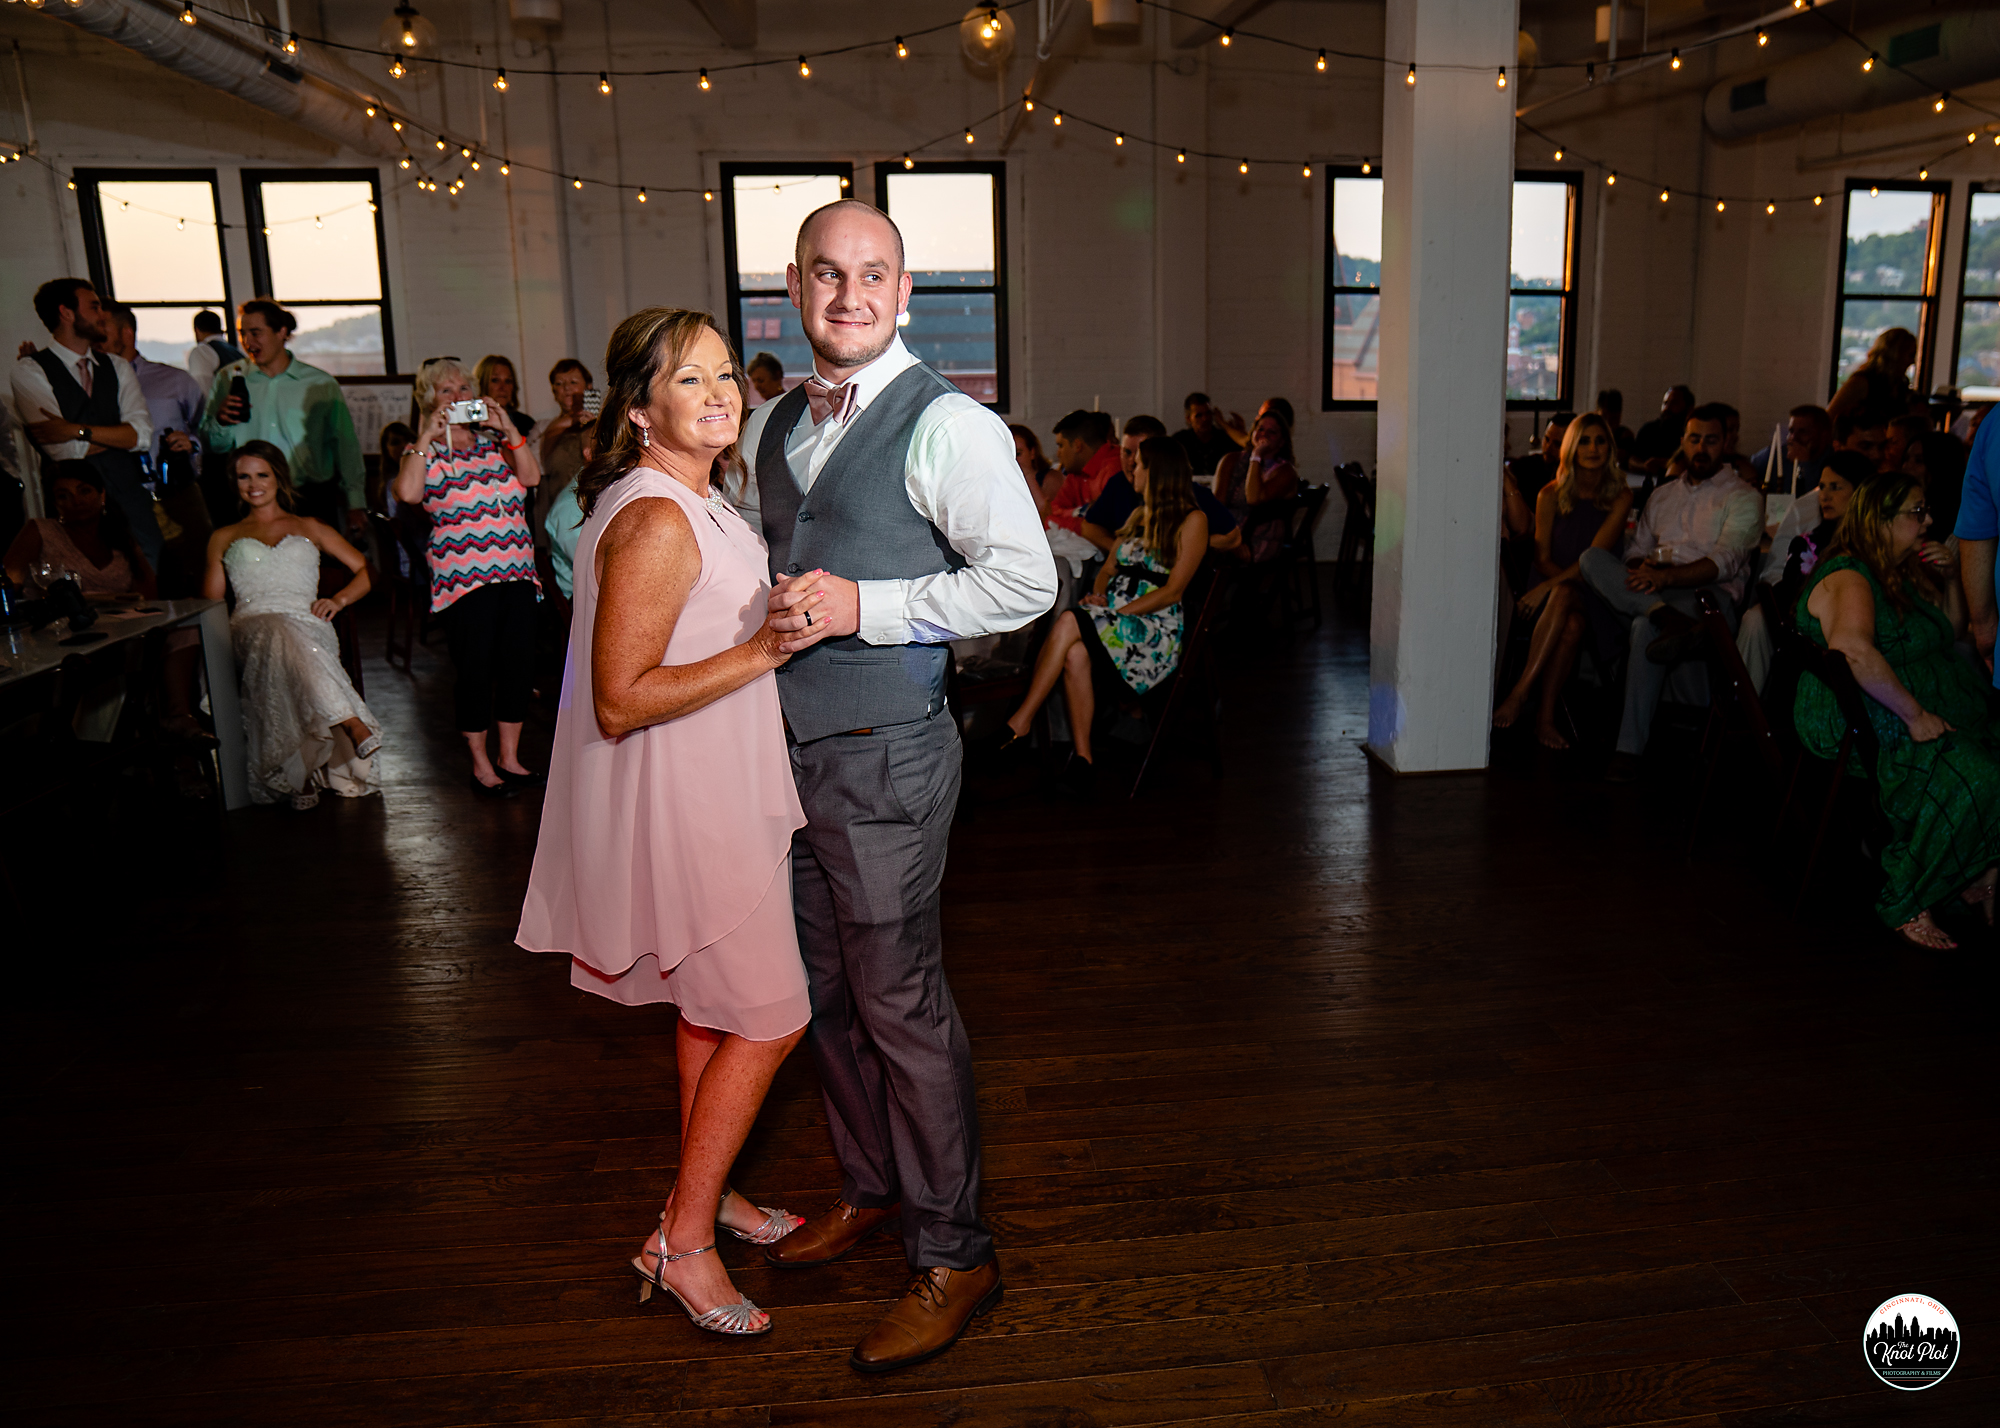 Strietmann-Penthaus-OTR-Cincinnati-Wedding-Photography-27.jpg